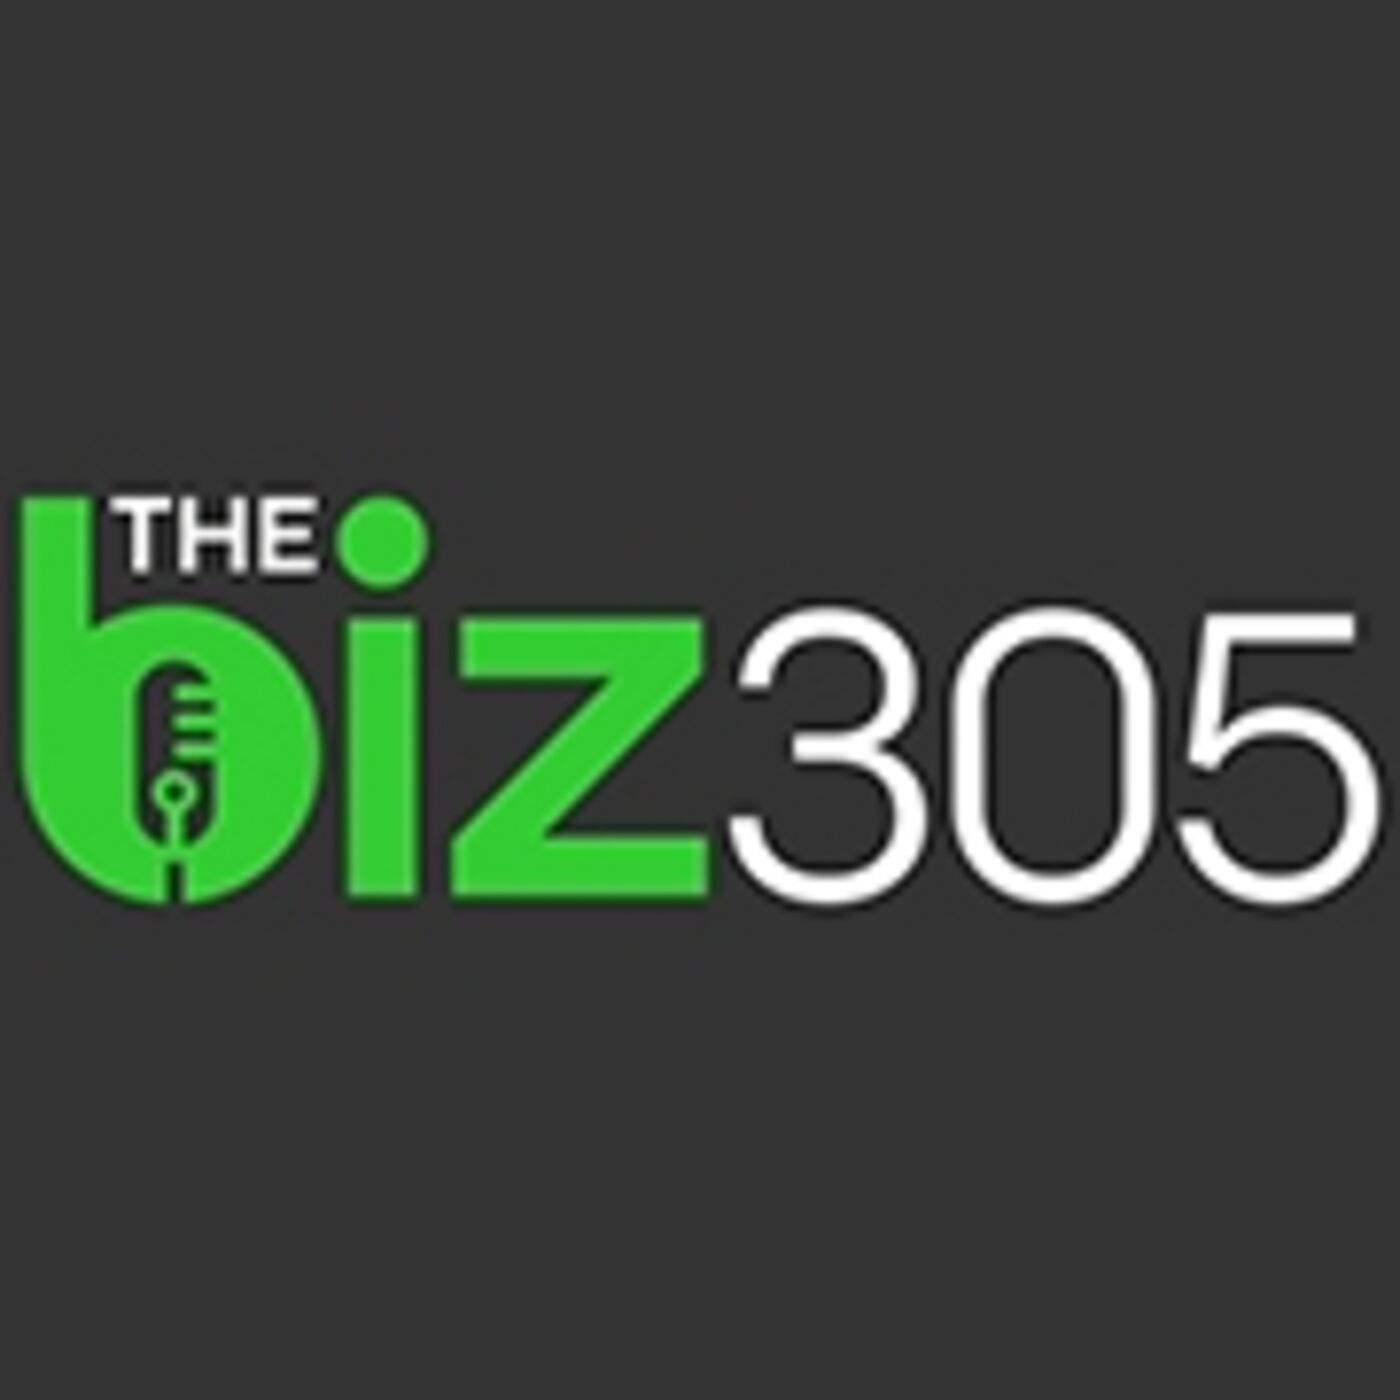 BIZ 305 features BIP BIP Nutrition   Whilly Bermudez